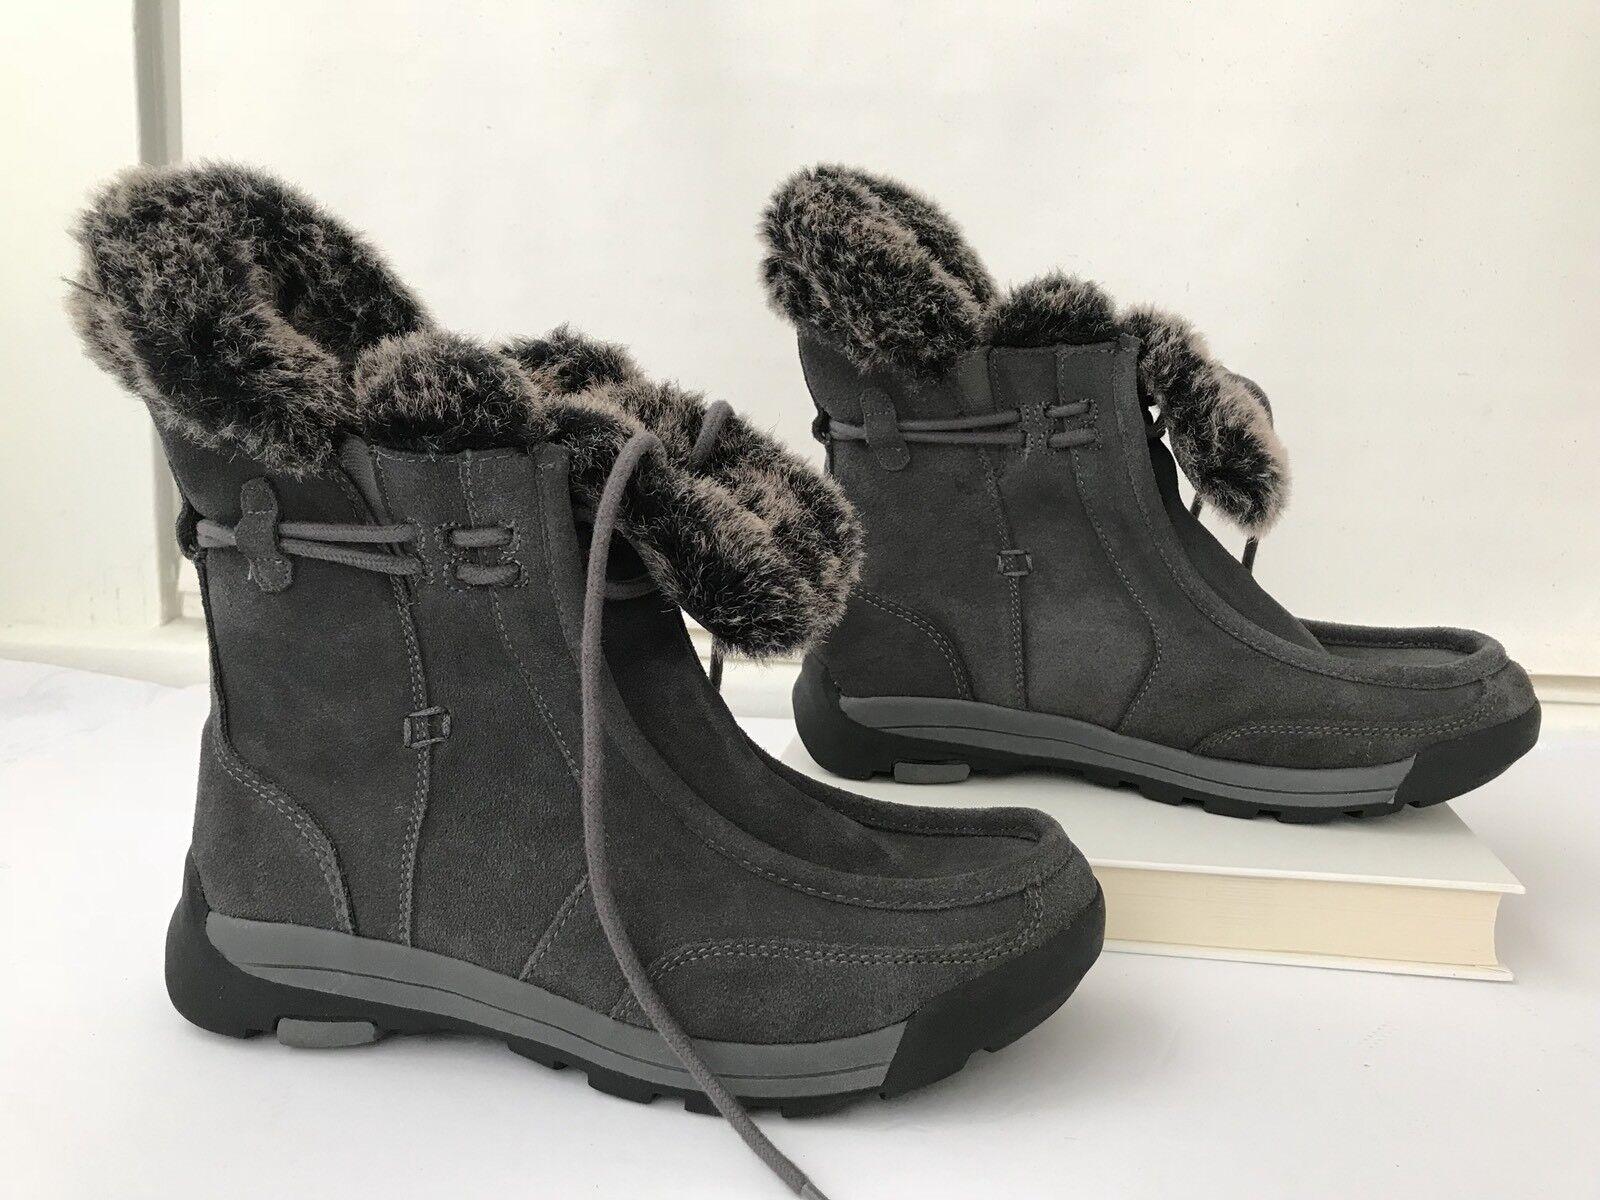 Women's Land's End 7 B Belle Winter Boots Booties Plush Faux Fur Gray Suede Lace